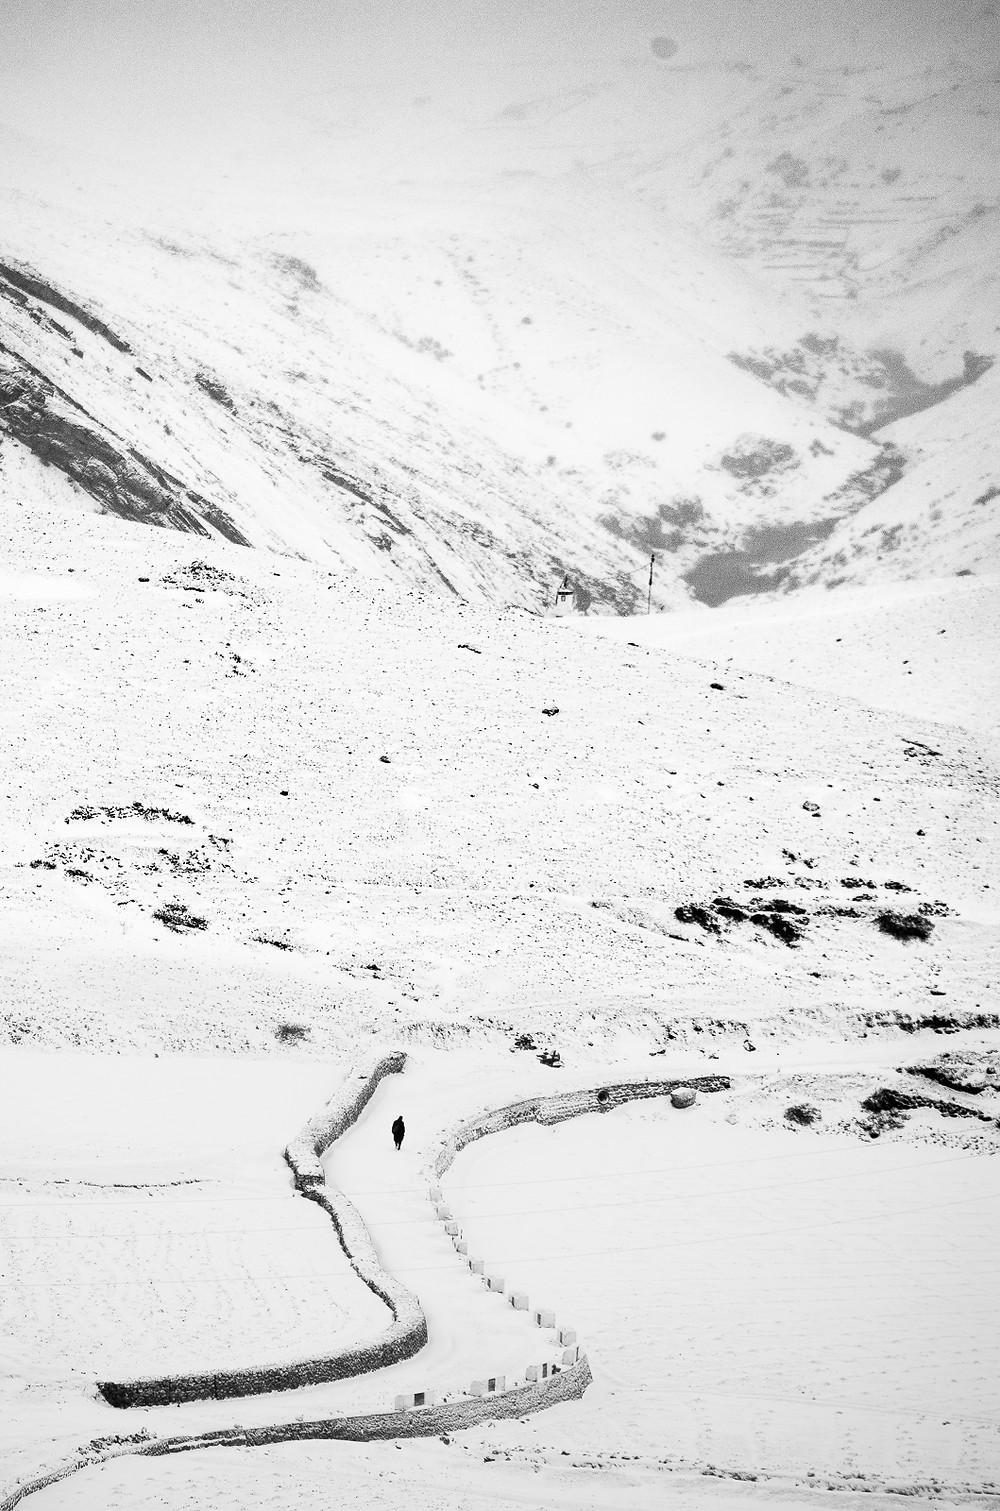 Kibber road in the winter